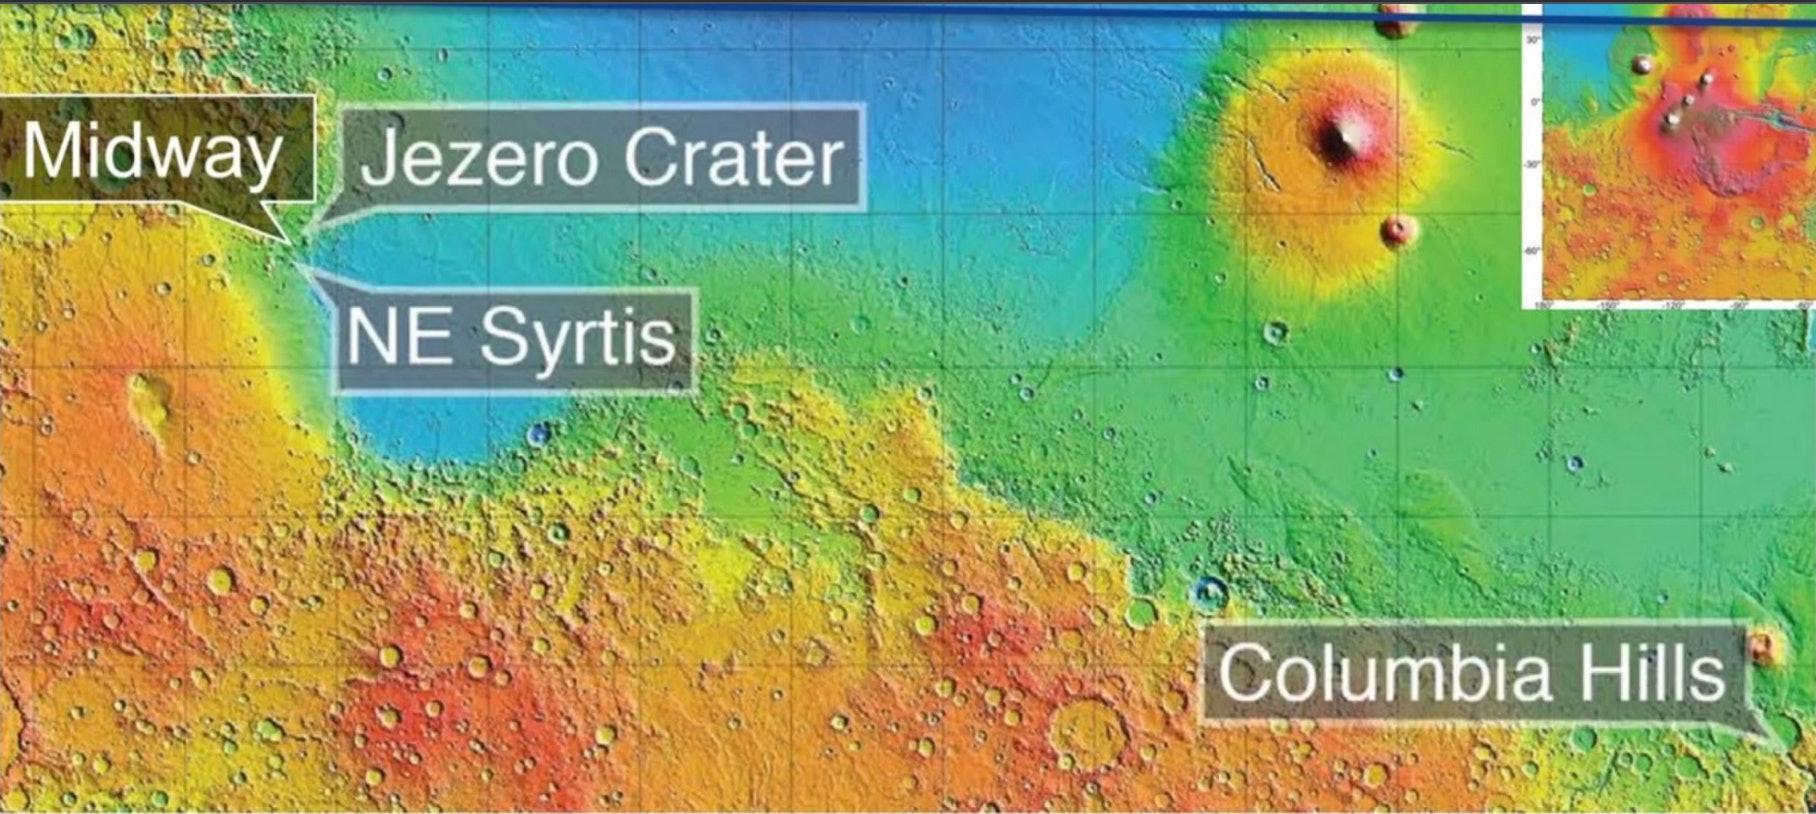 Map of final four Mars 2020 landing sites